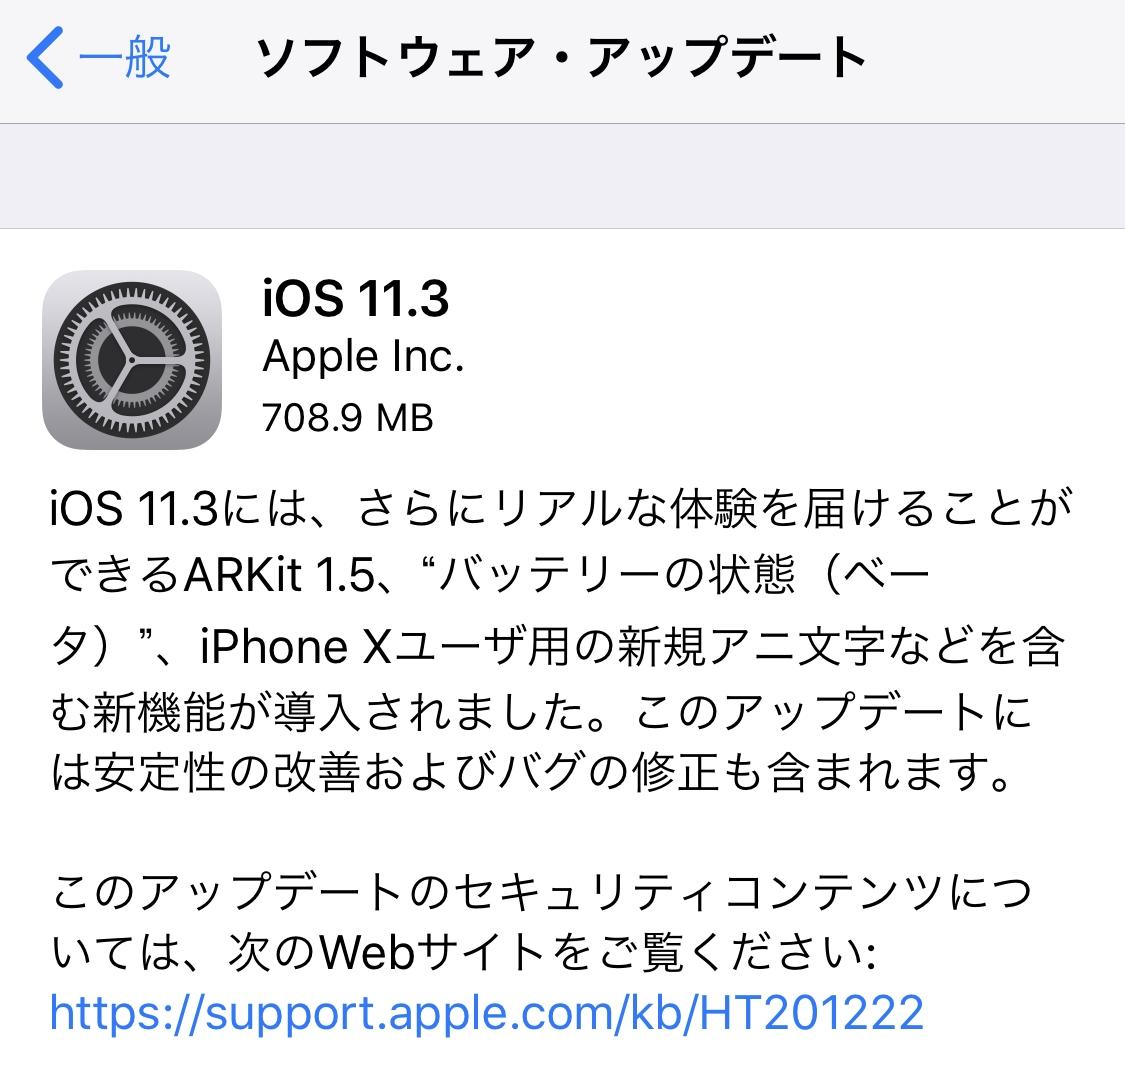 iOS11.3の不具合・評判は?ARKit 1.5対応、バッテリー状態表示、アニ文字追加等【Apple】格安SIMの対応状況もアリ